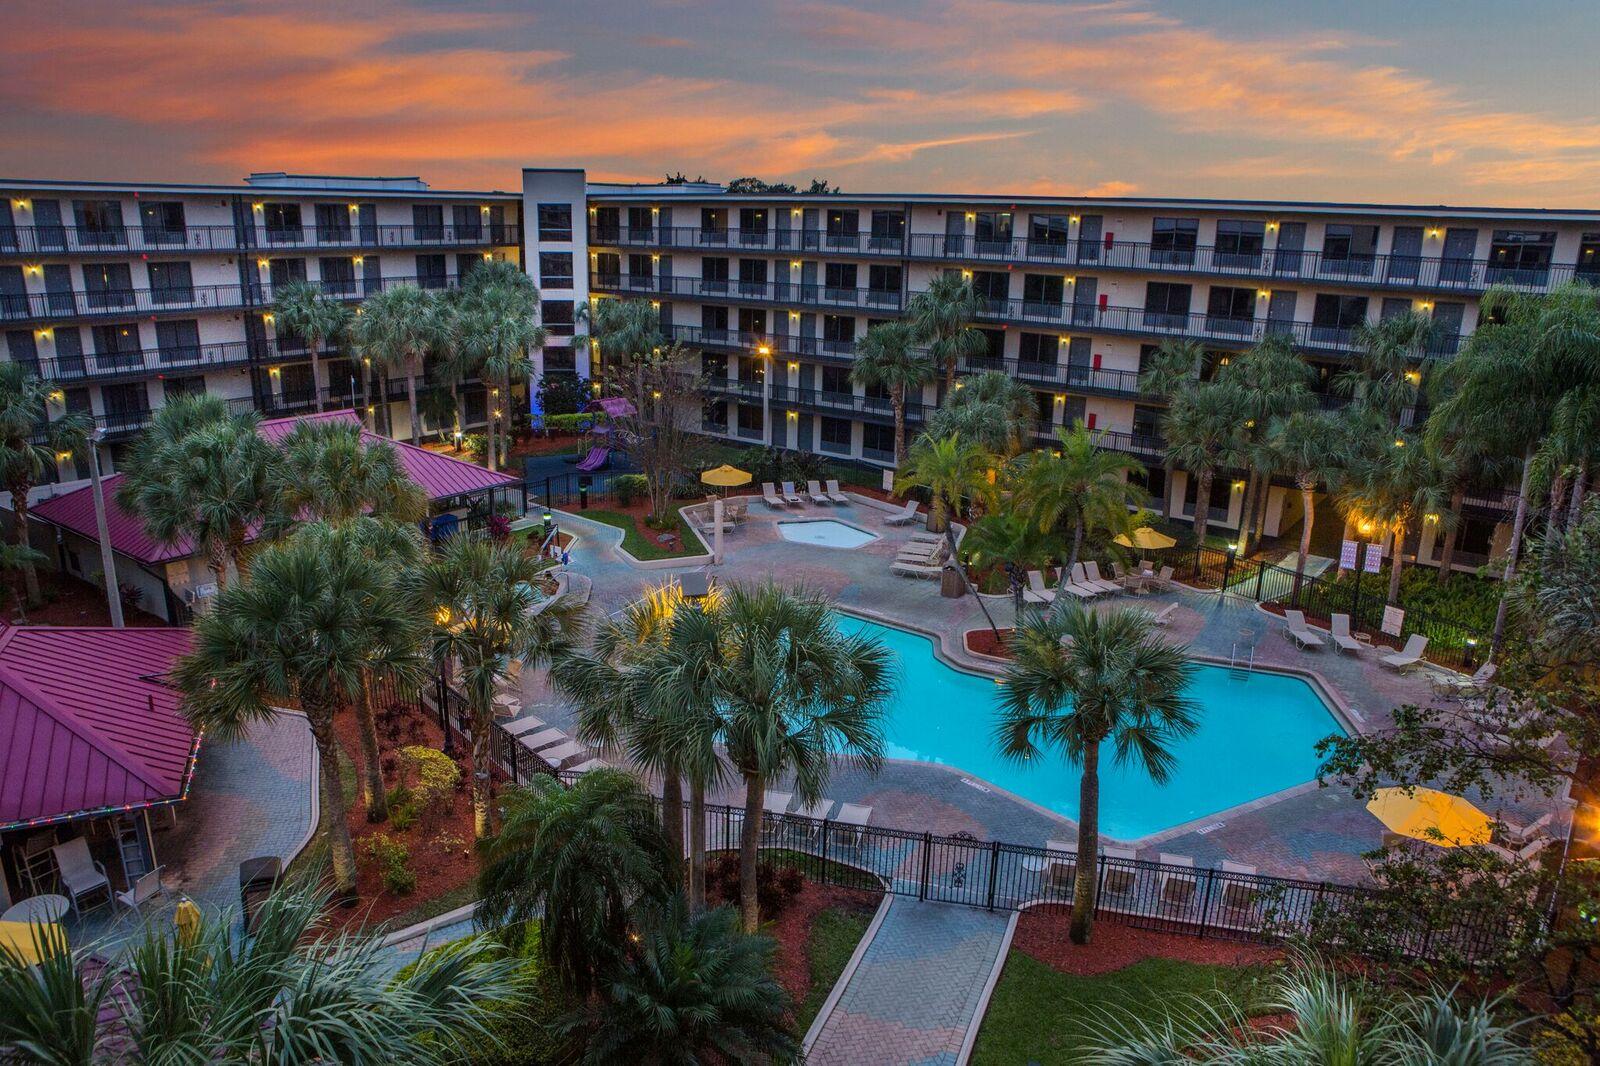 Staybridge Suites Royale Parc Orlando Tropical Pool Area 3